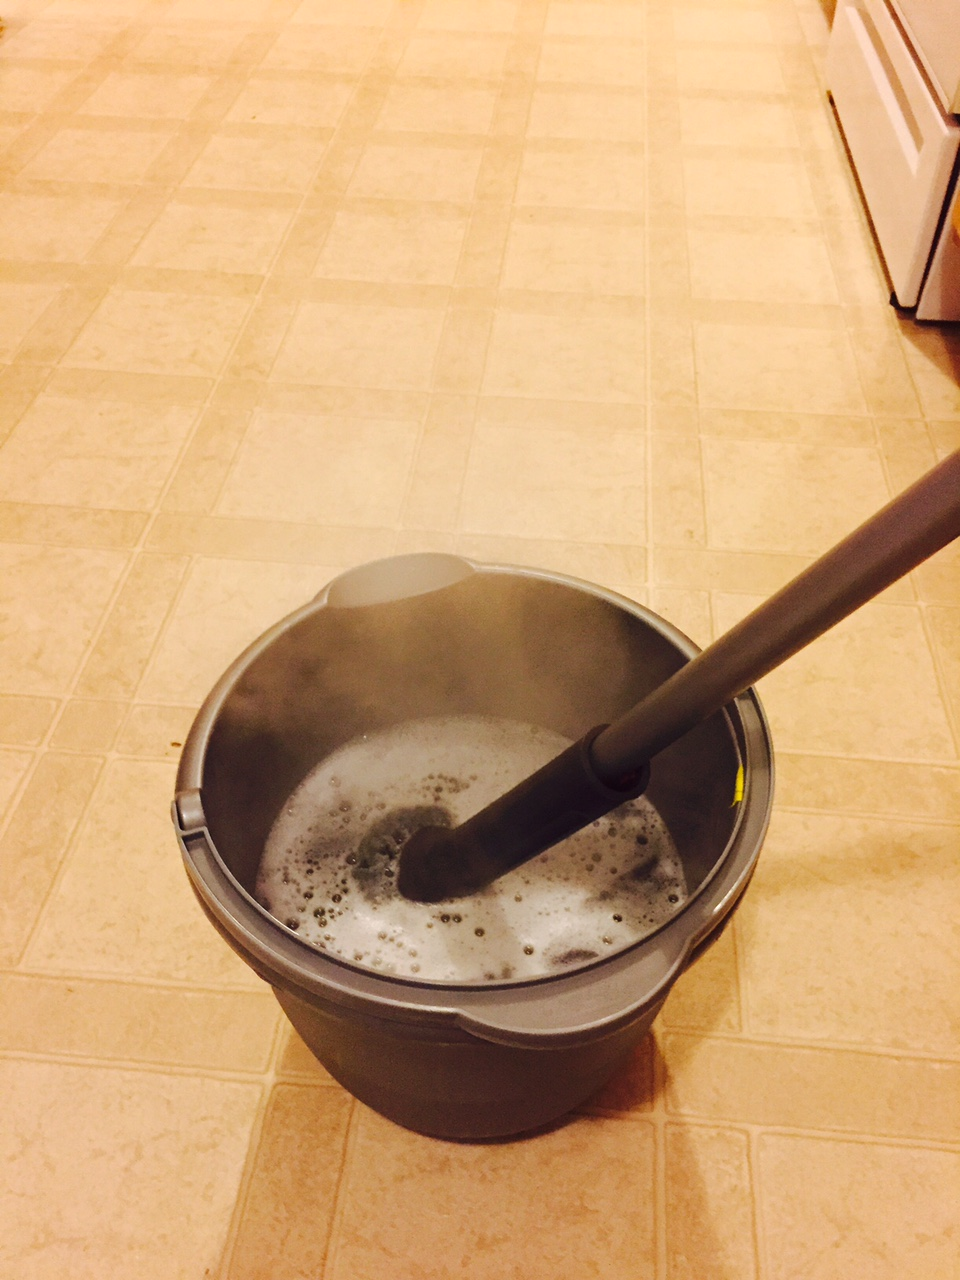 My favorite chore!